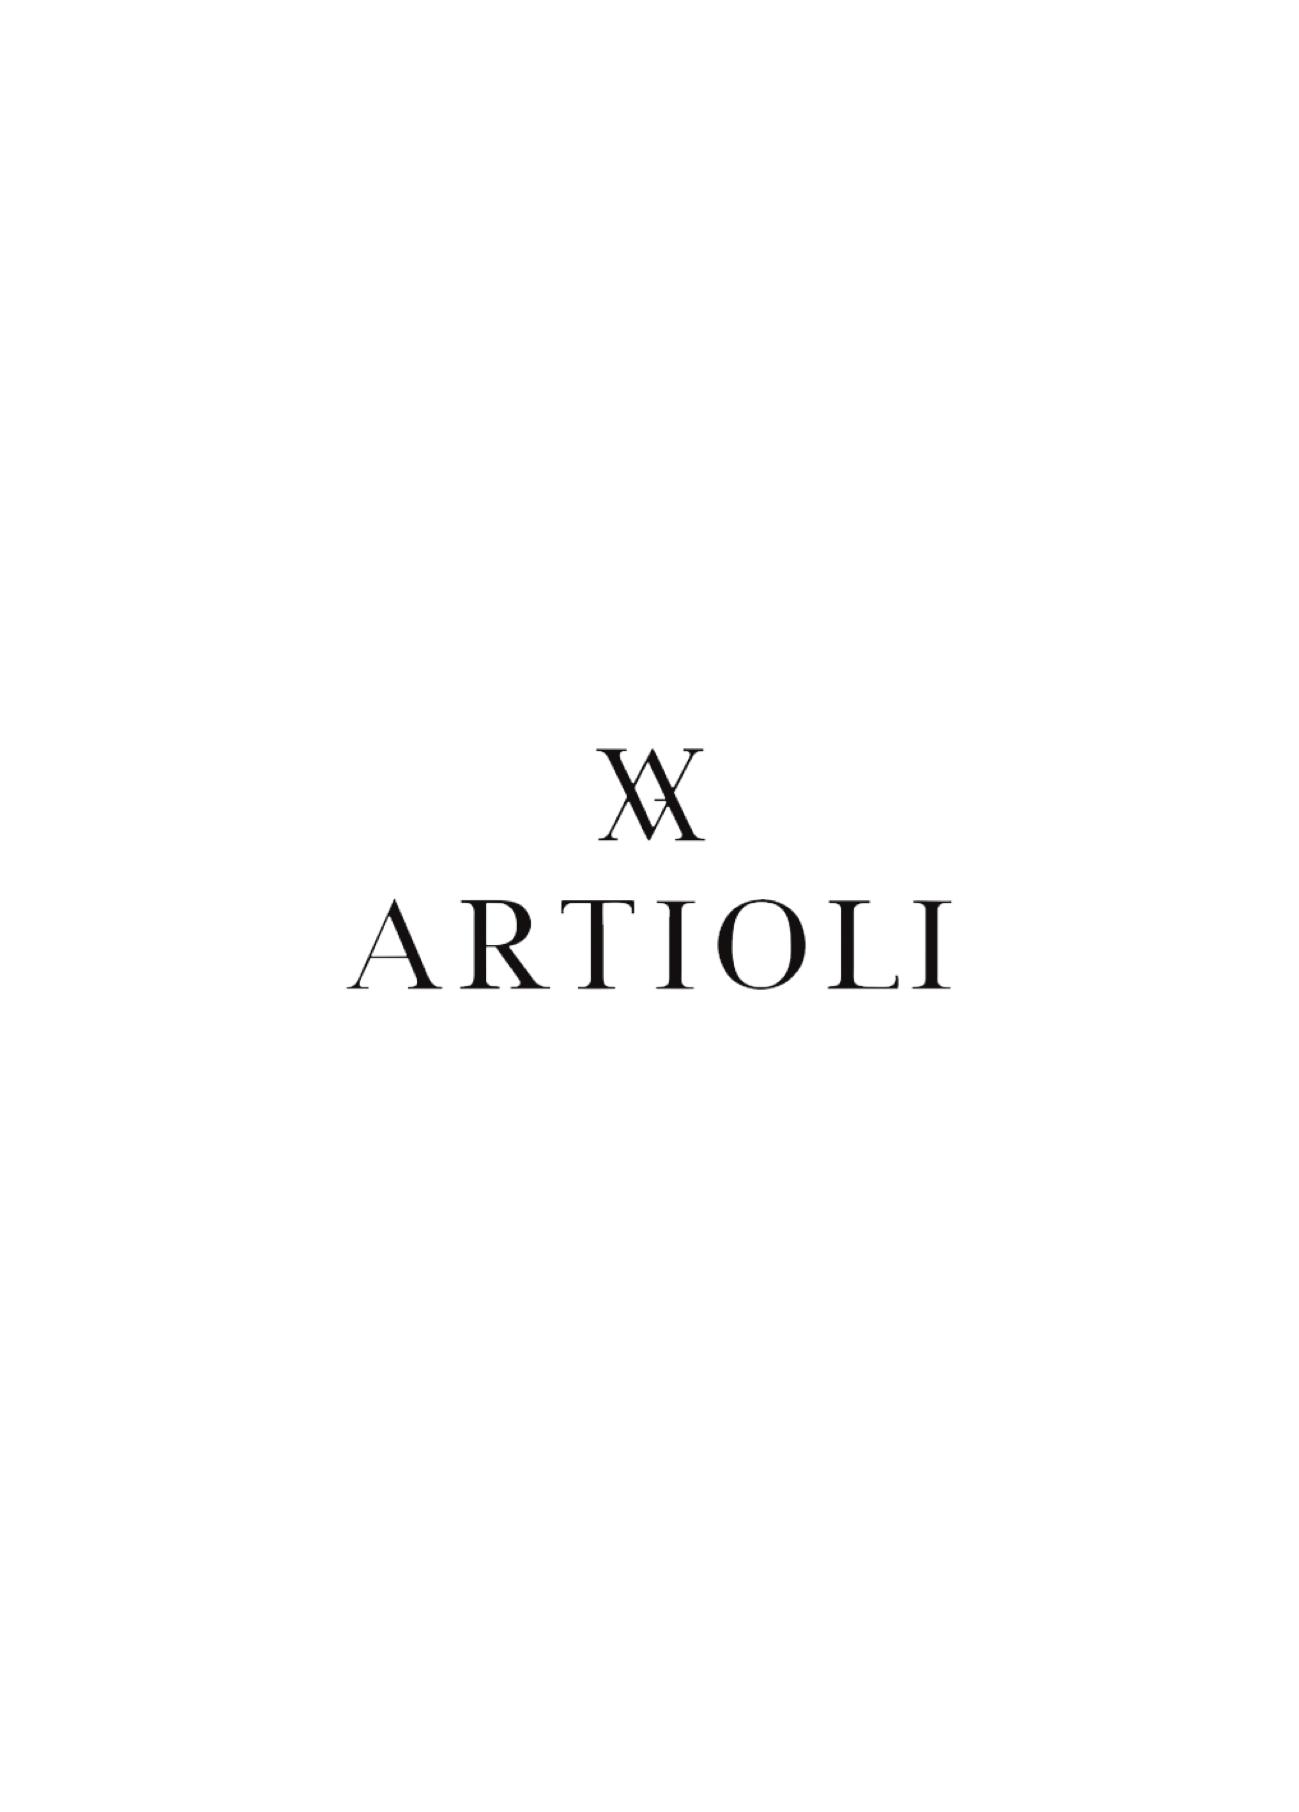 Artioli_FallWinter_20172018 1.jpeg